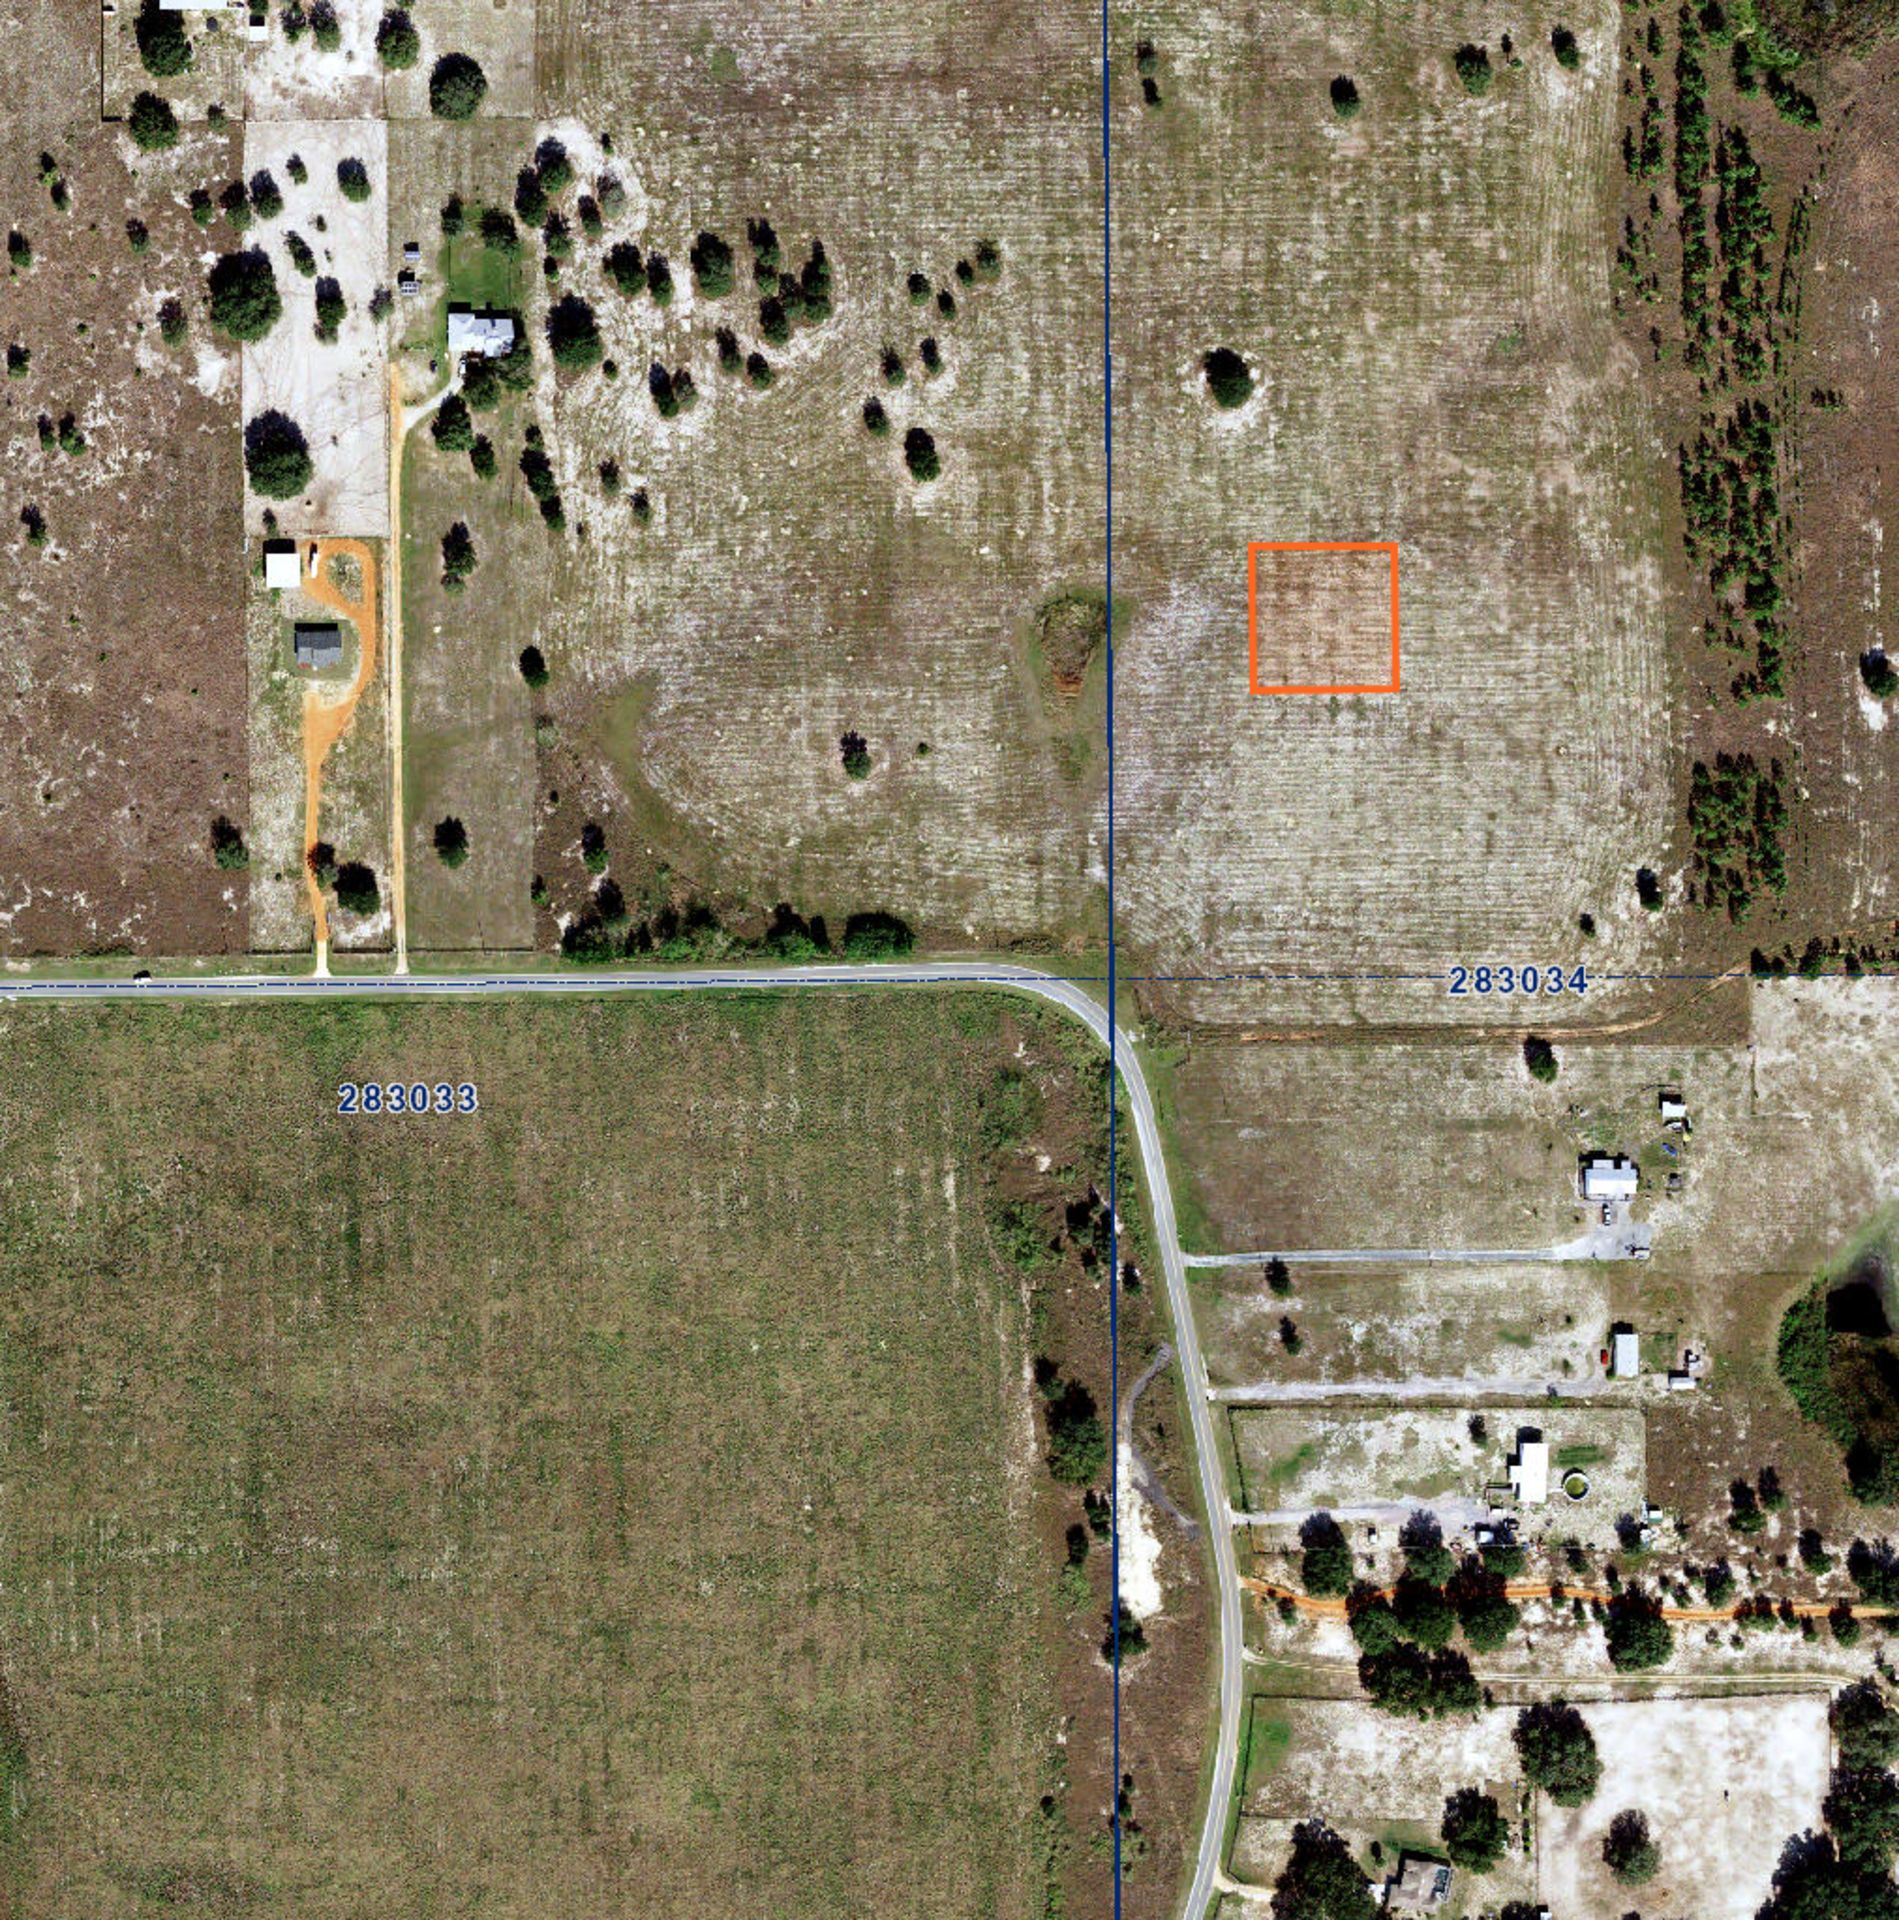 Peaceful Polk County, Florida! - Image 2 of 6